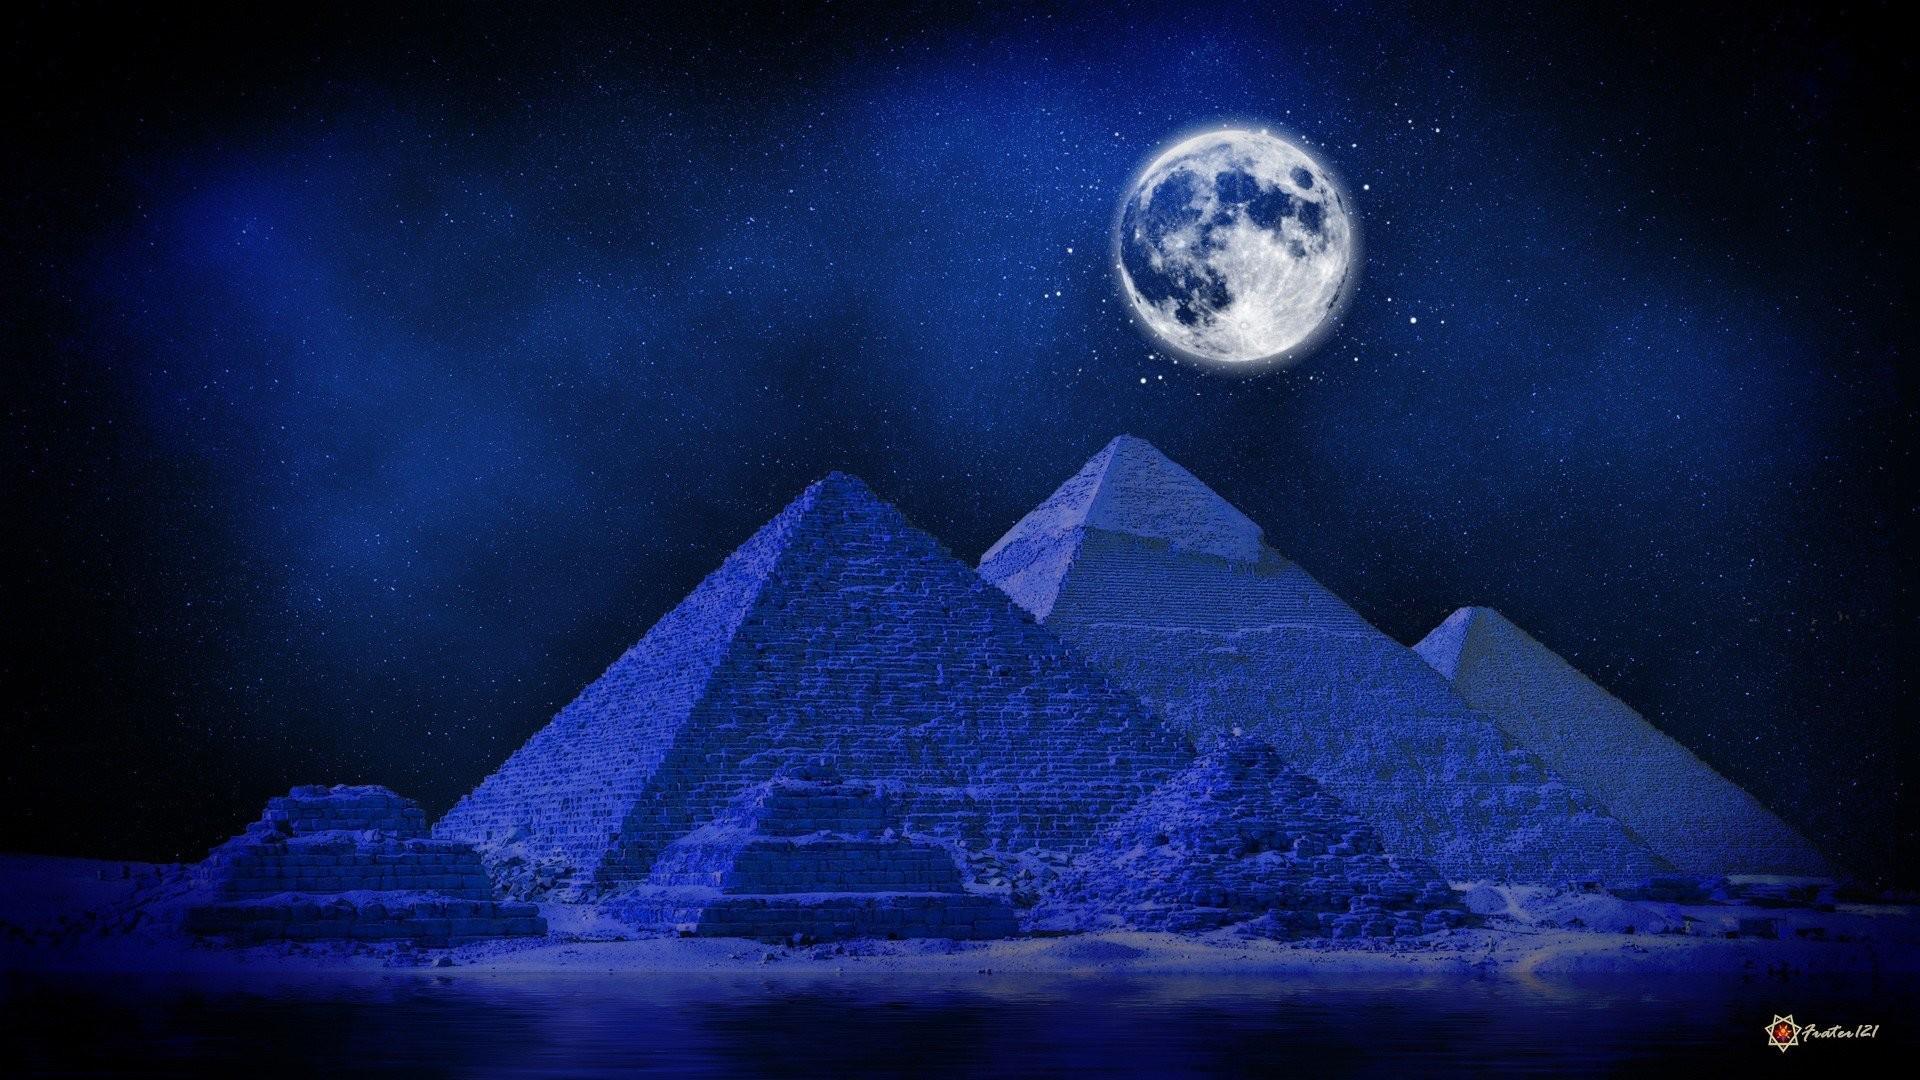 Blue deserts digital art artwork Full Moon pyramids midnight wallpaper |  | 323740 | WallpaperUP